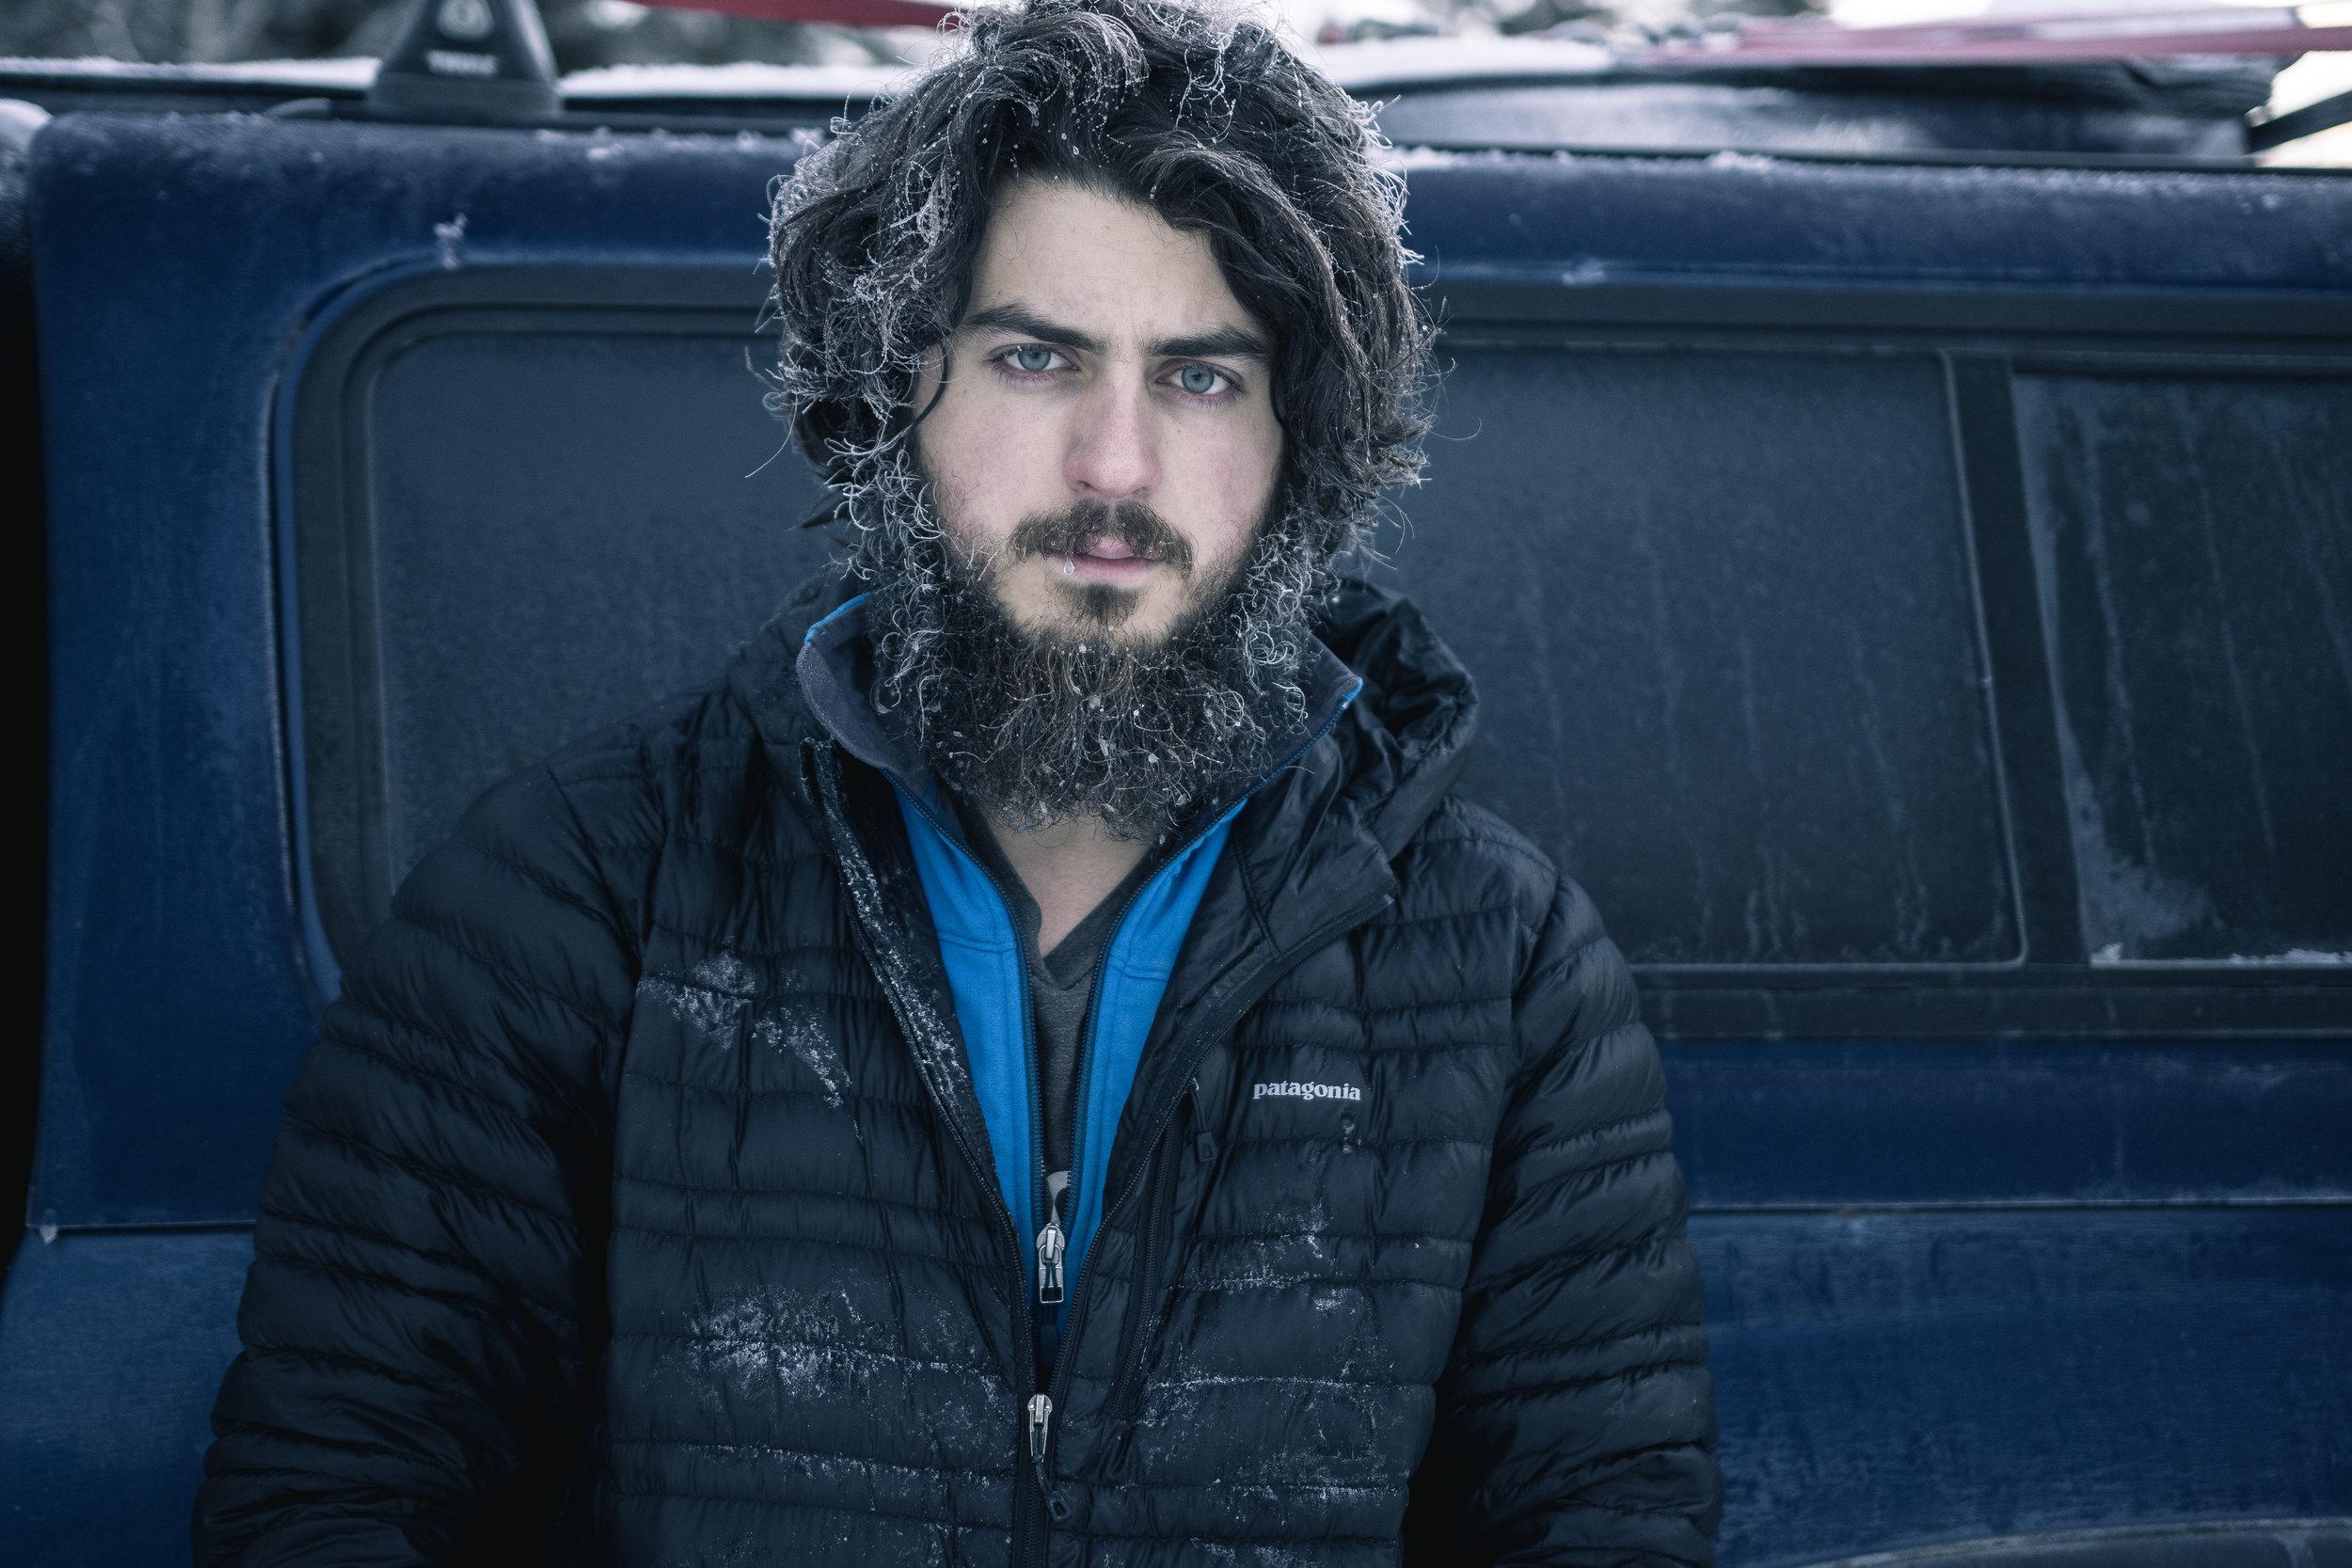 Longer hair, shorter beard now. And a little less snow. (Liard River, British Columbia)